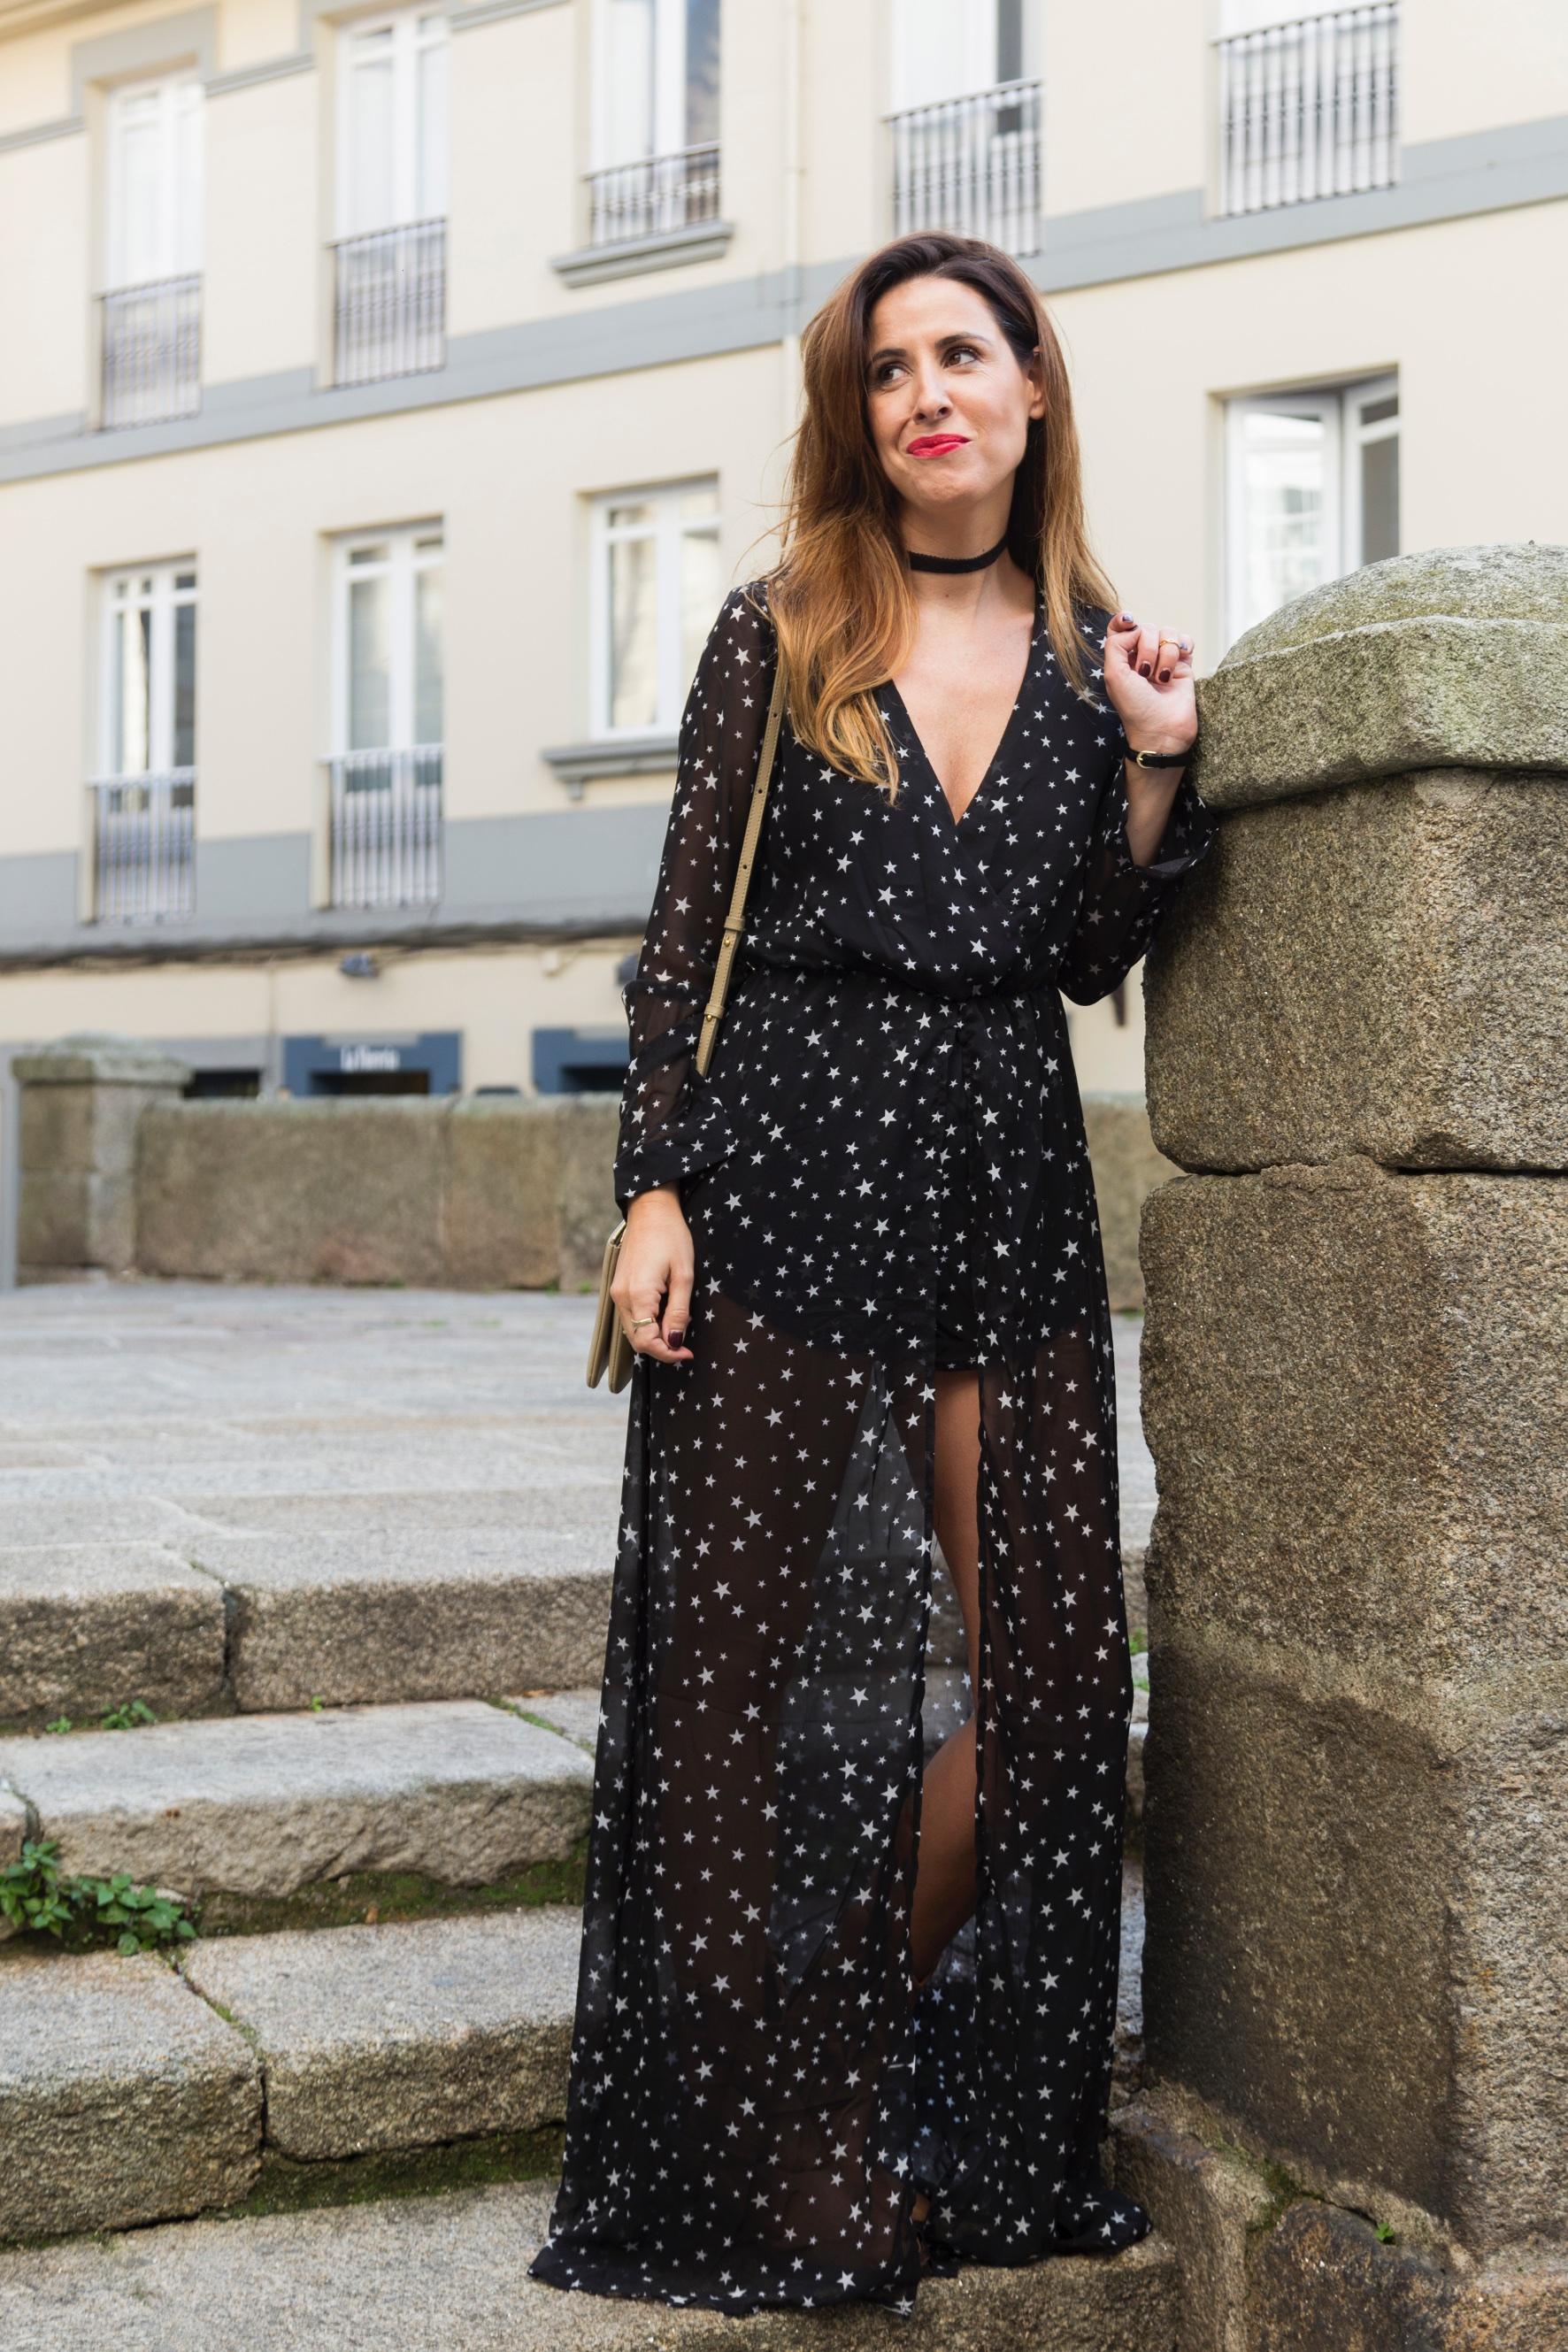 shein-dress-fashion-blogger-descalzaporelparque-6